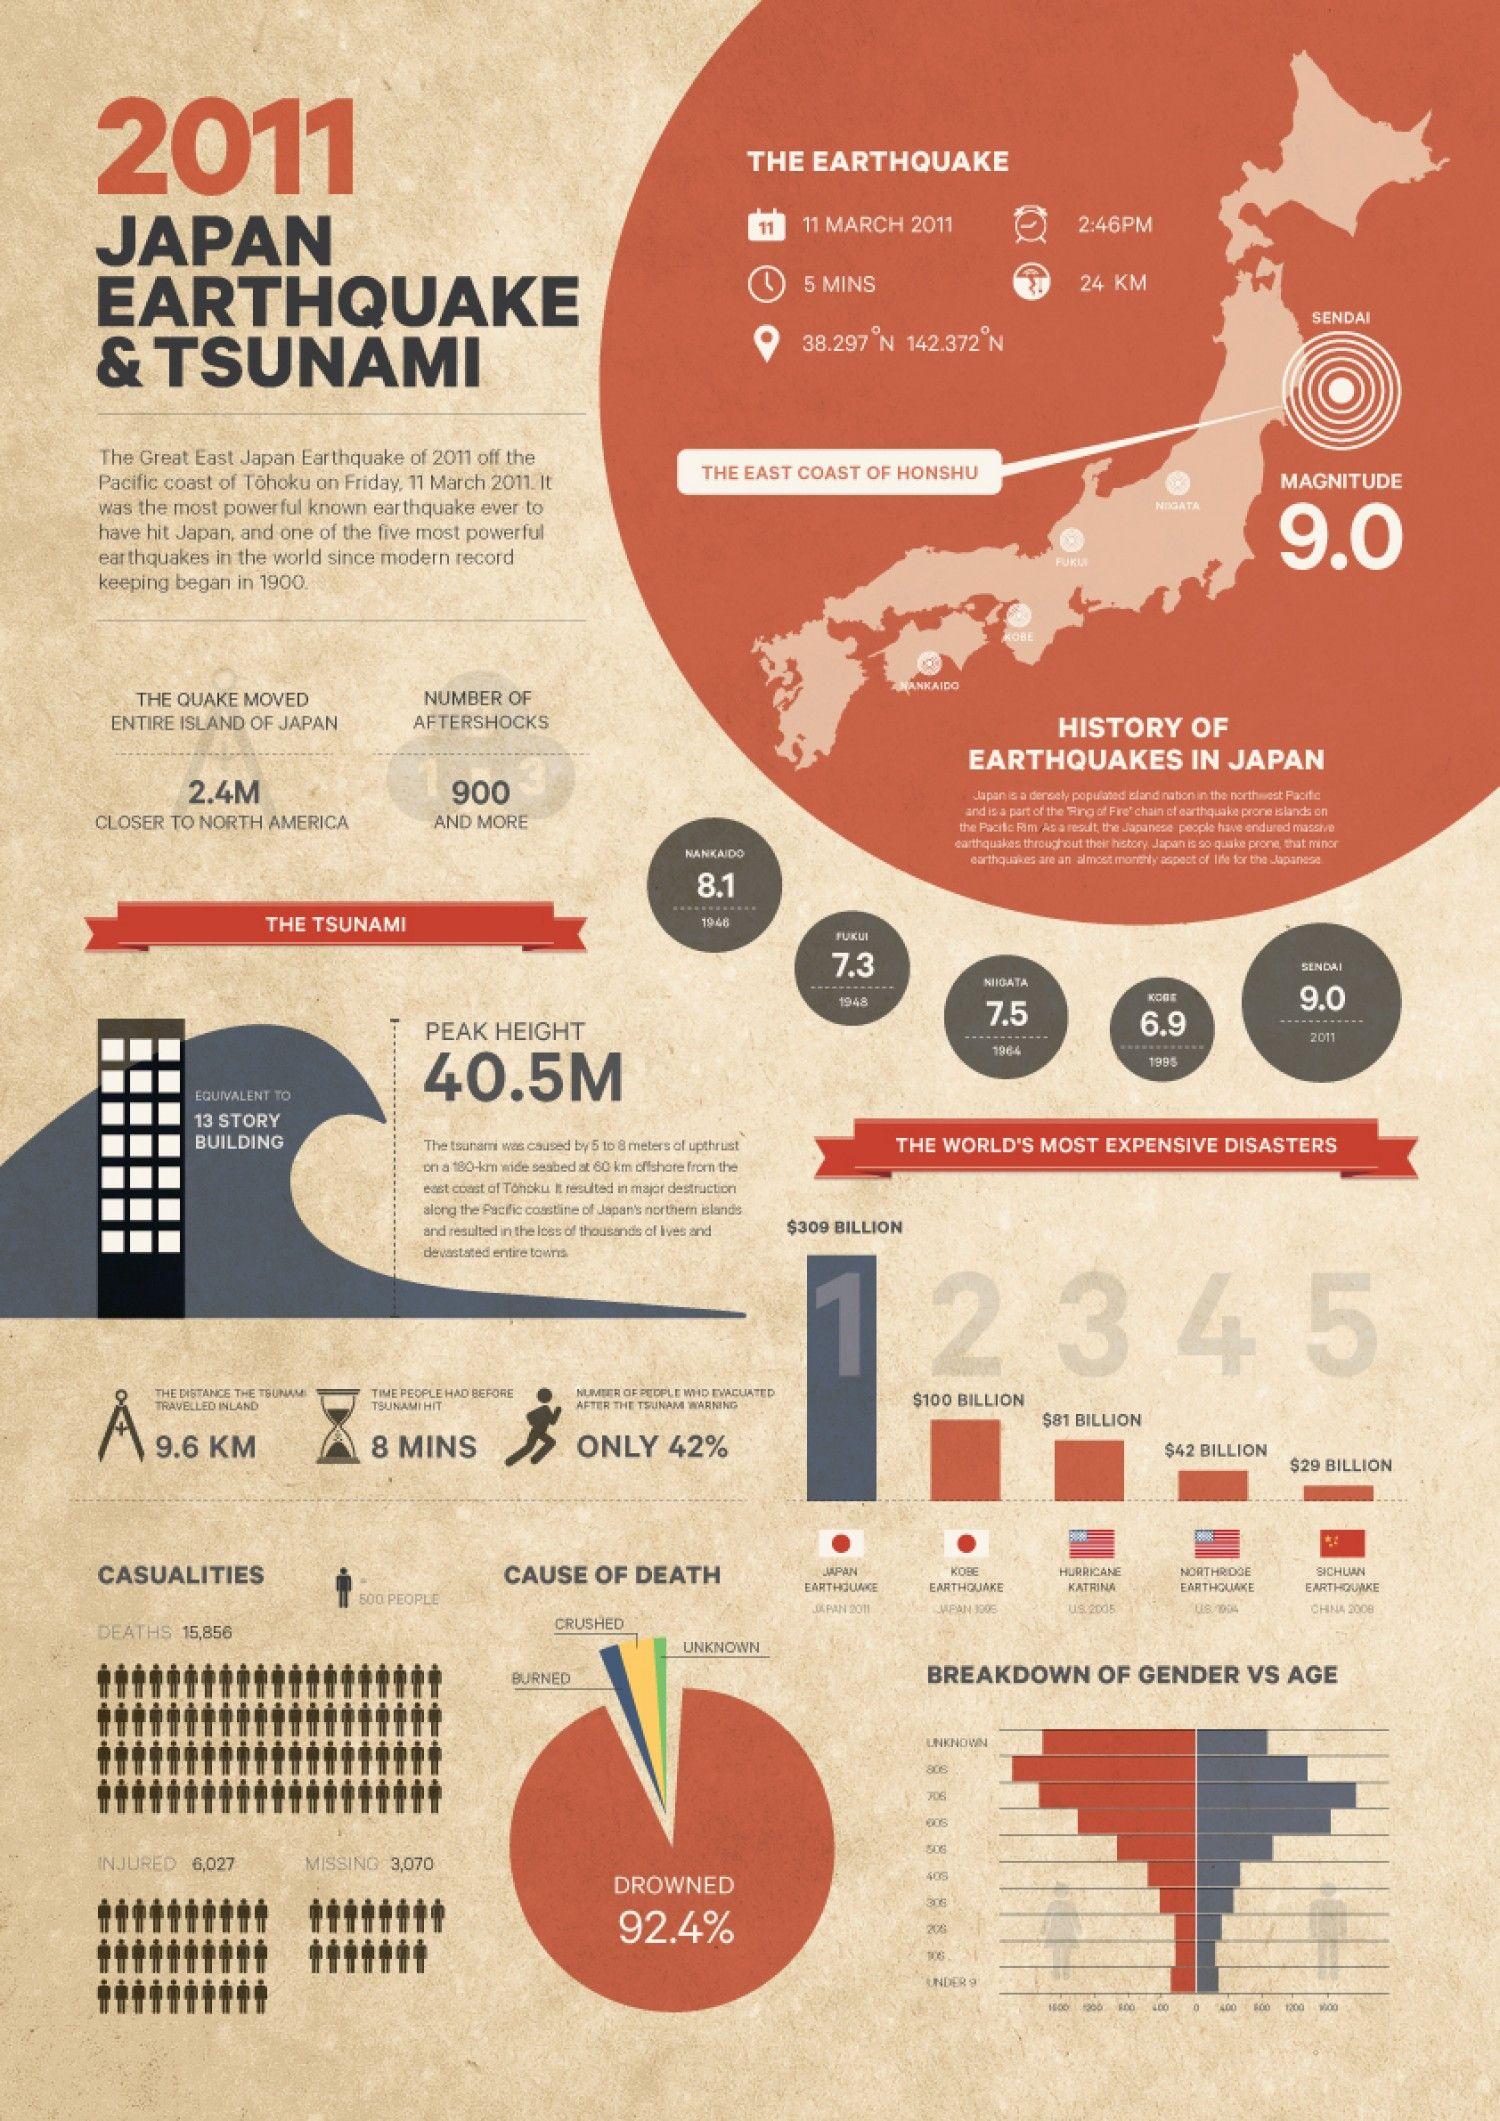 Japan Earthquake Infographic | Useful Classroom Images ...